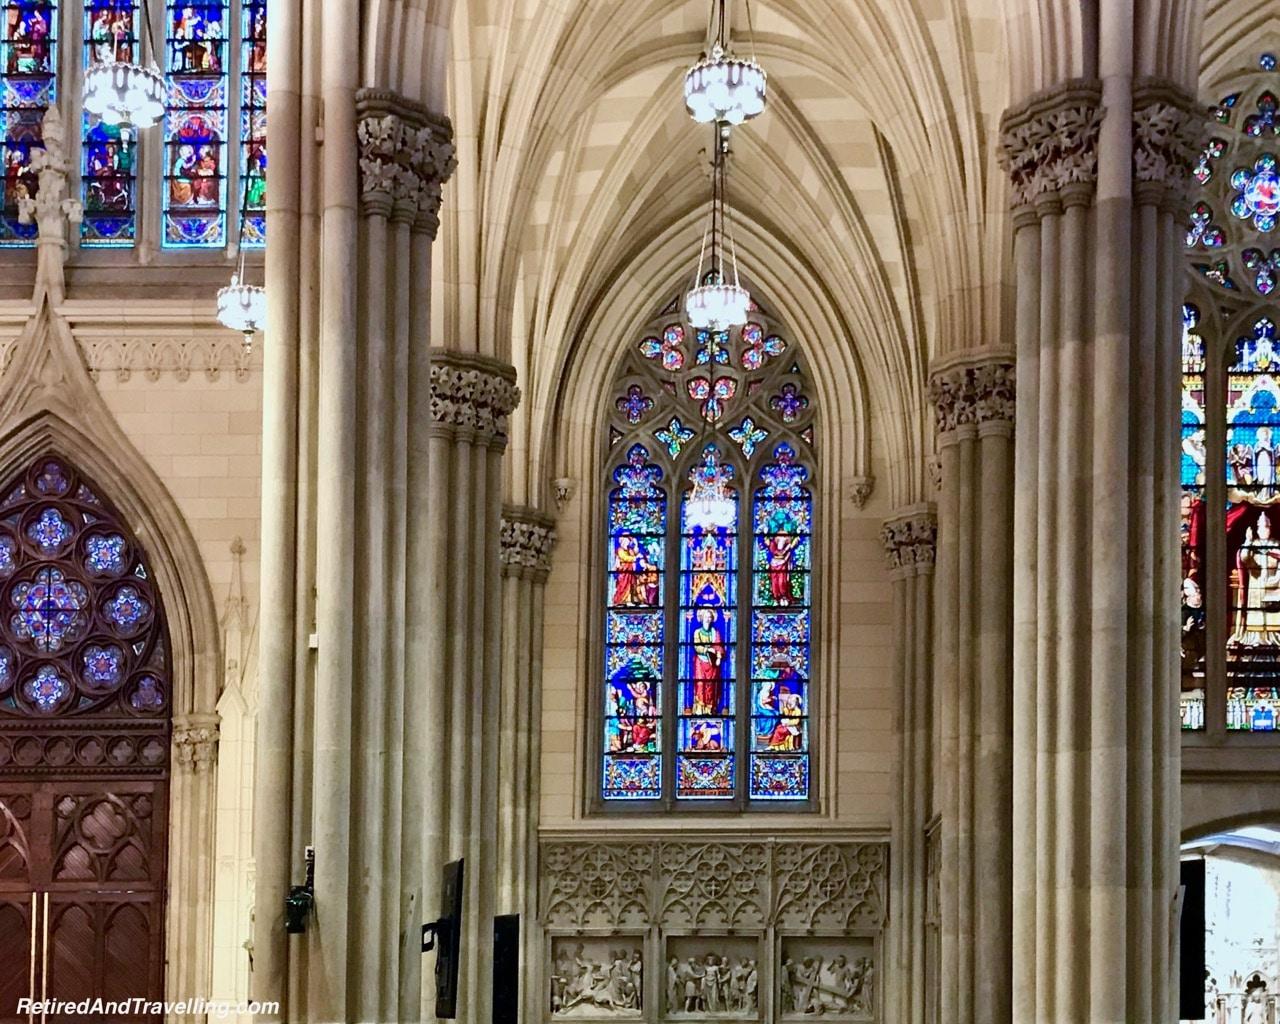 St Patricks Cathedral Holiday Decor - Holiday Visit To NYC.jpg